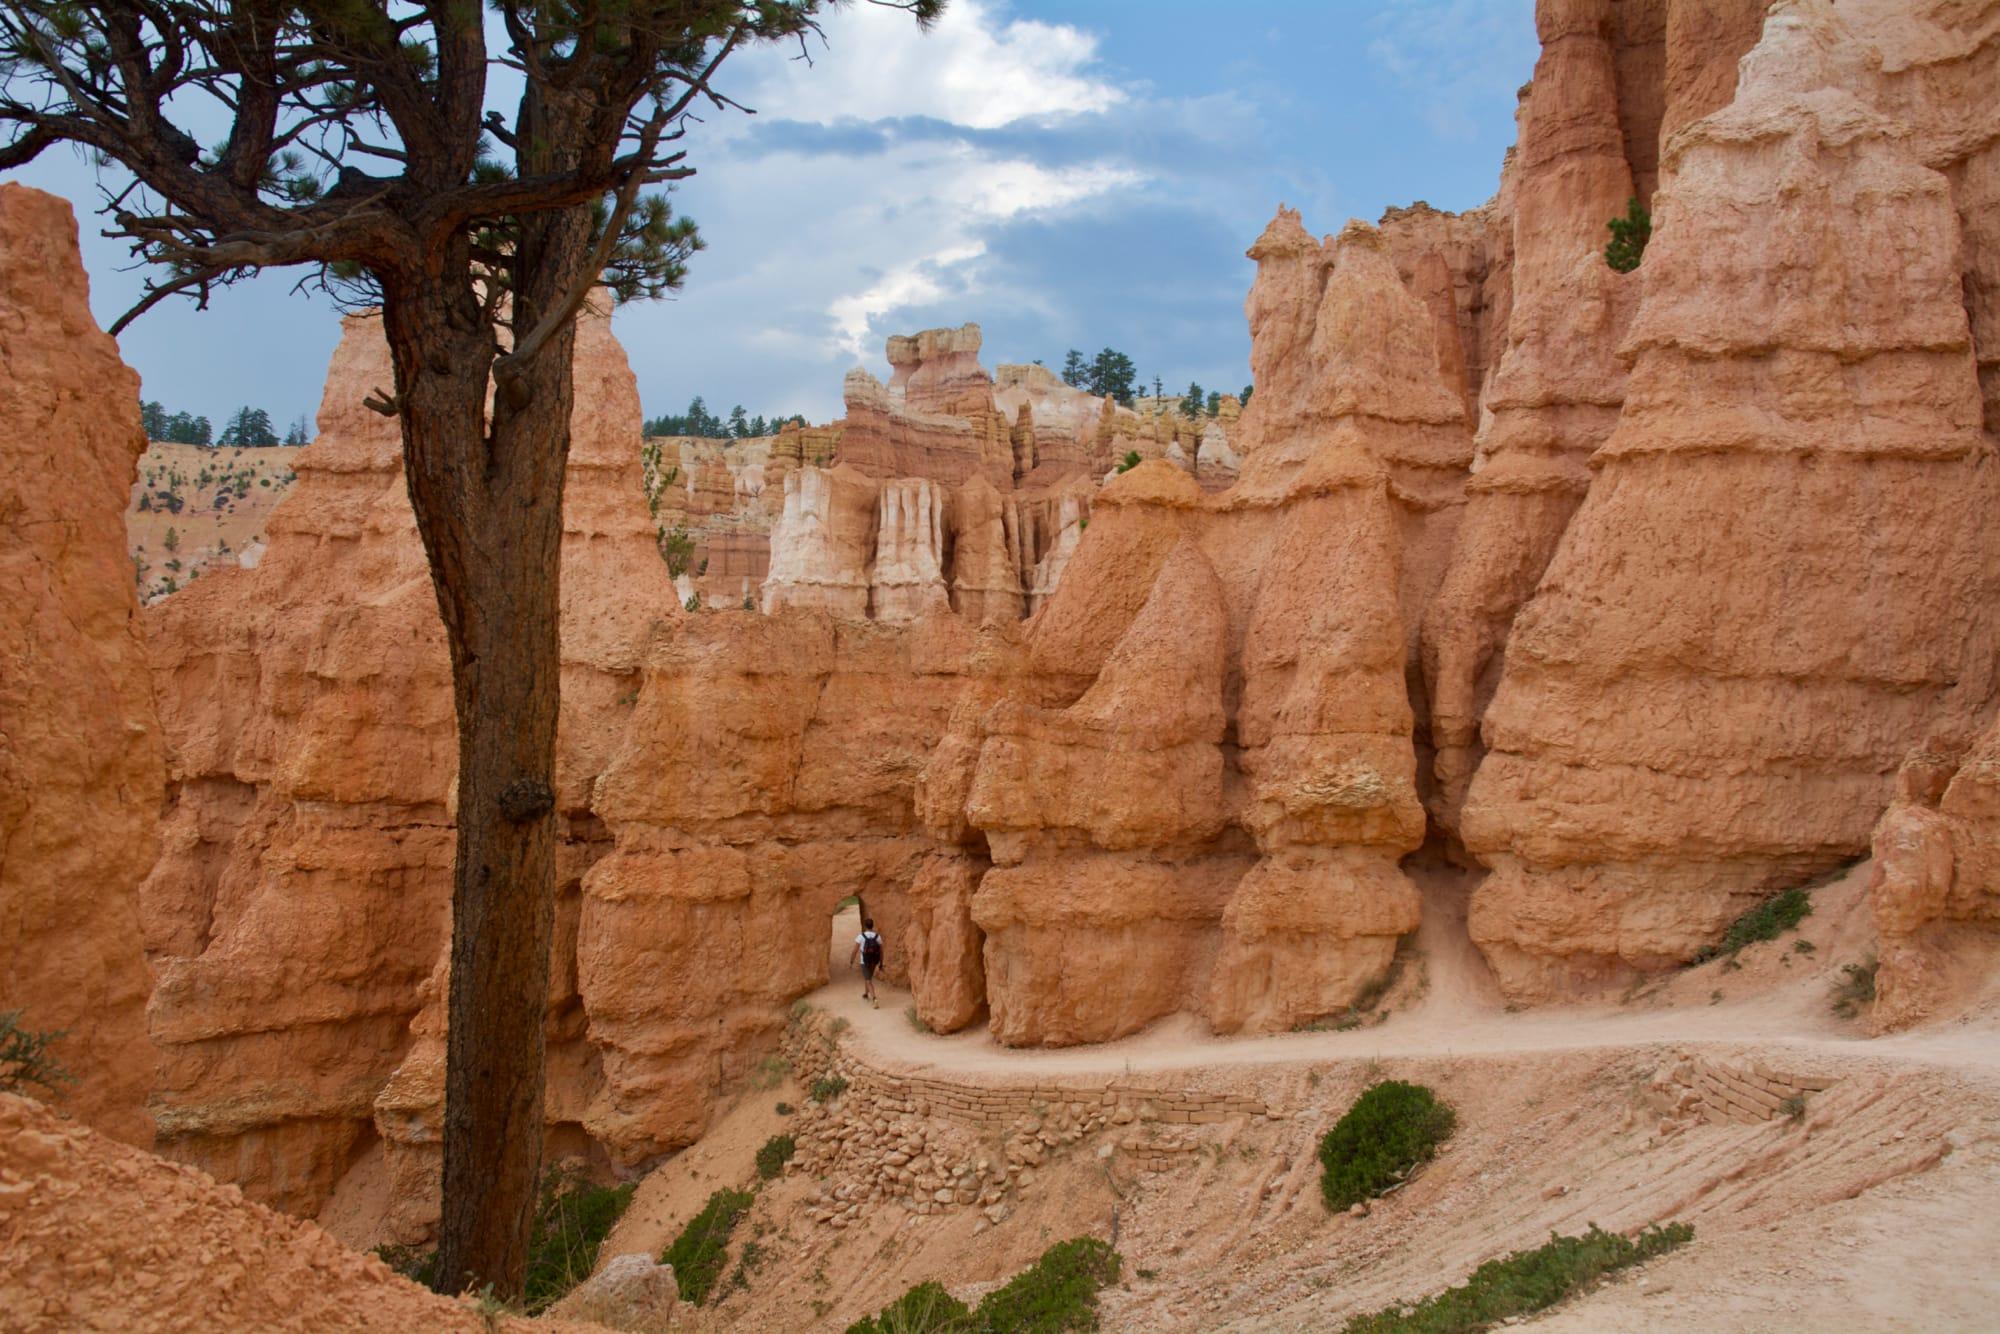 Queens-Navajo Combination Loop Trail 1, Bryce National Park